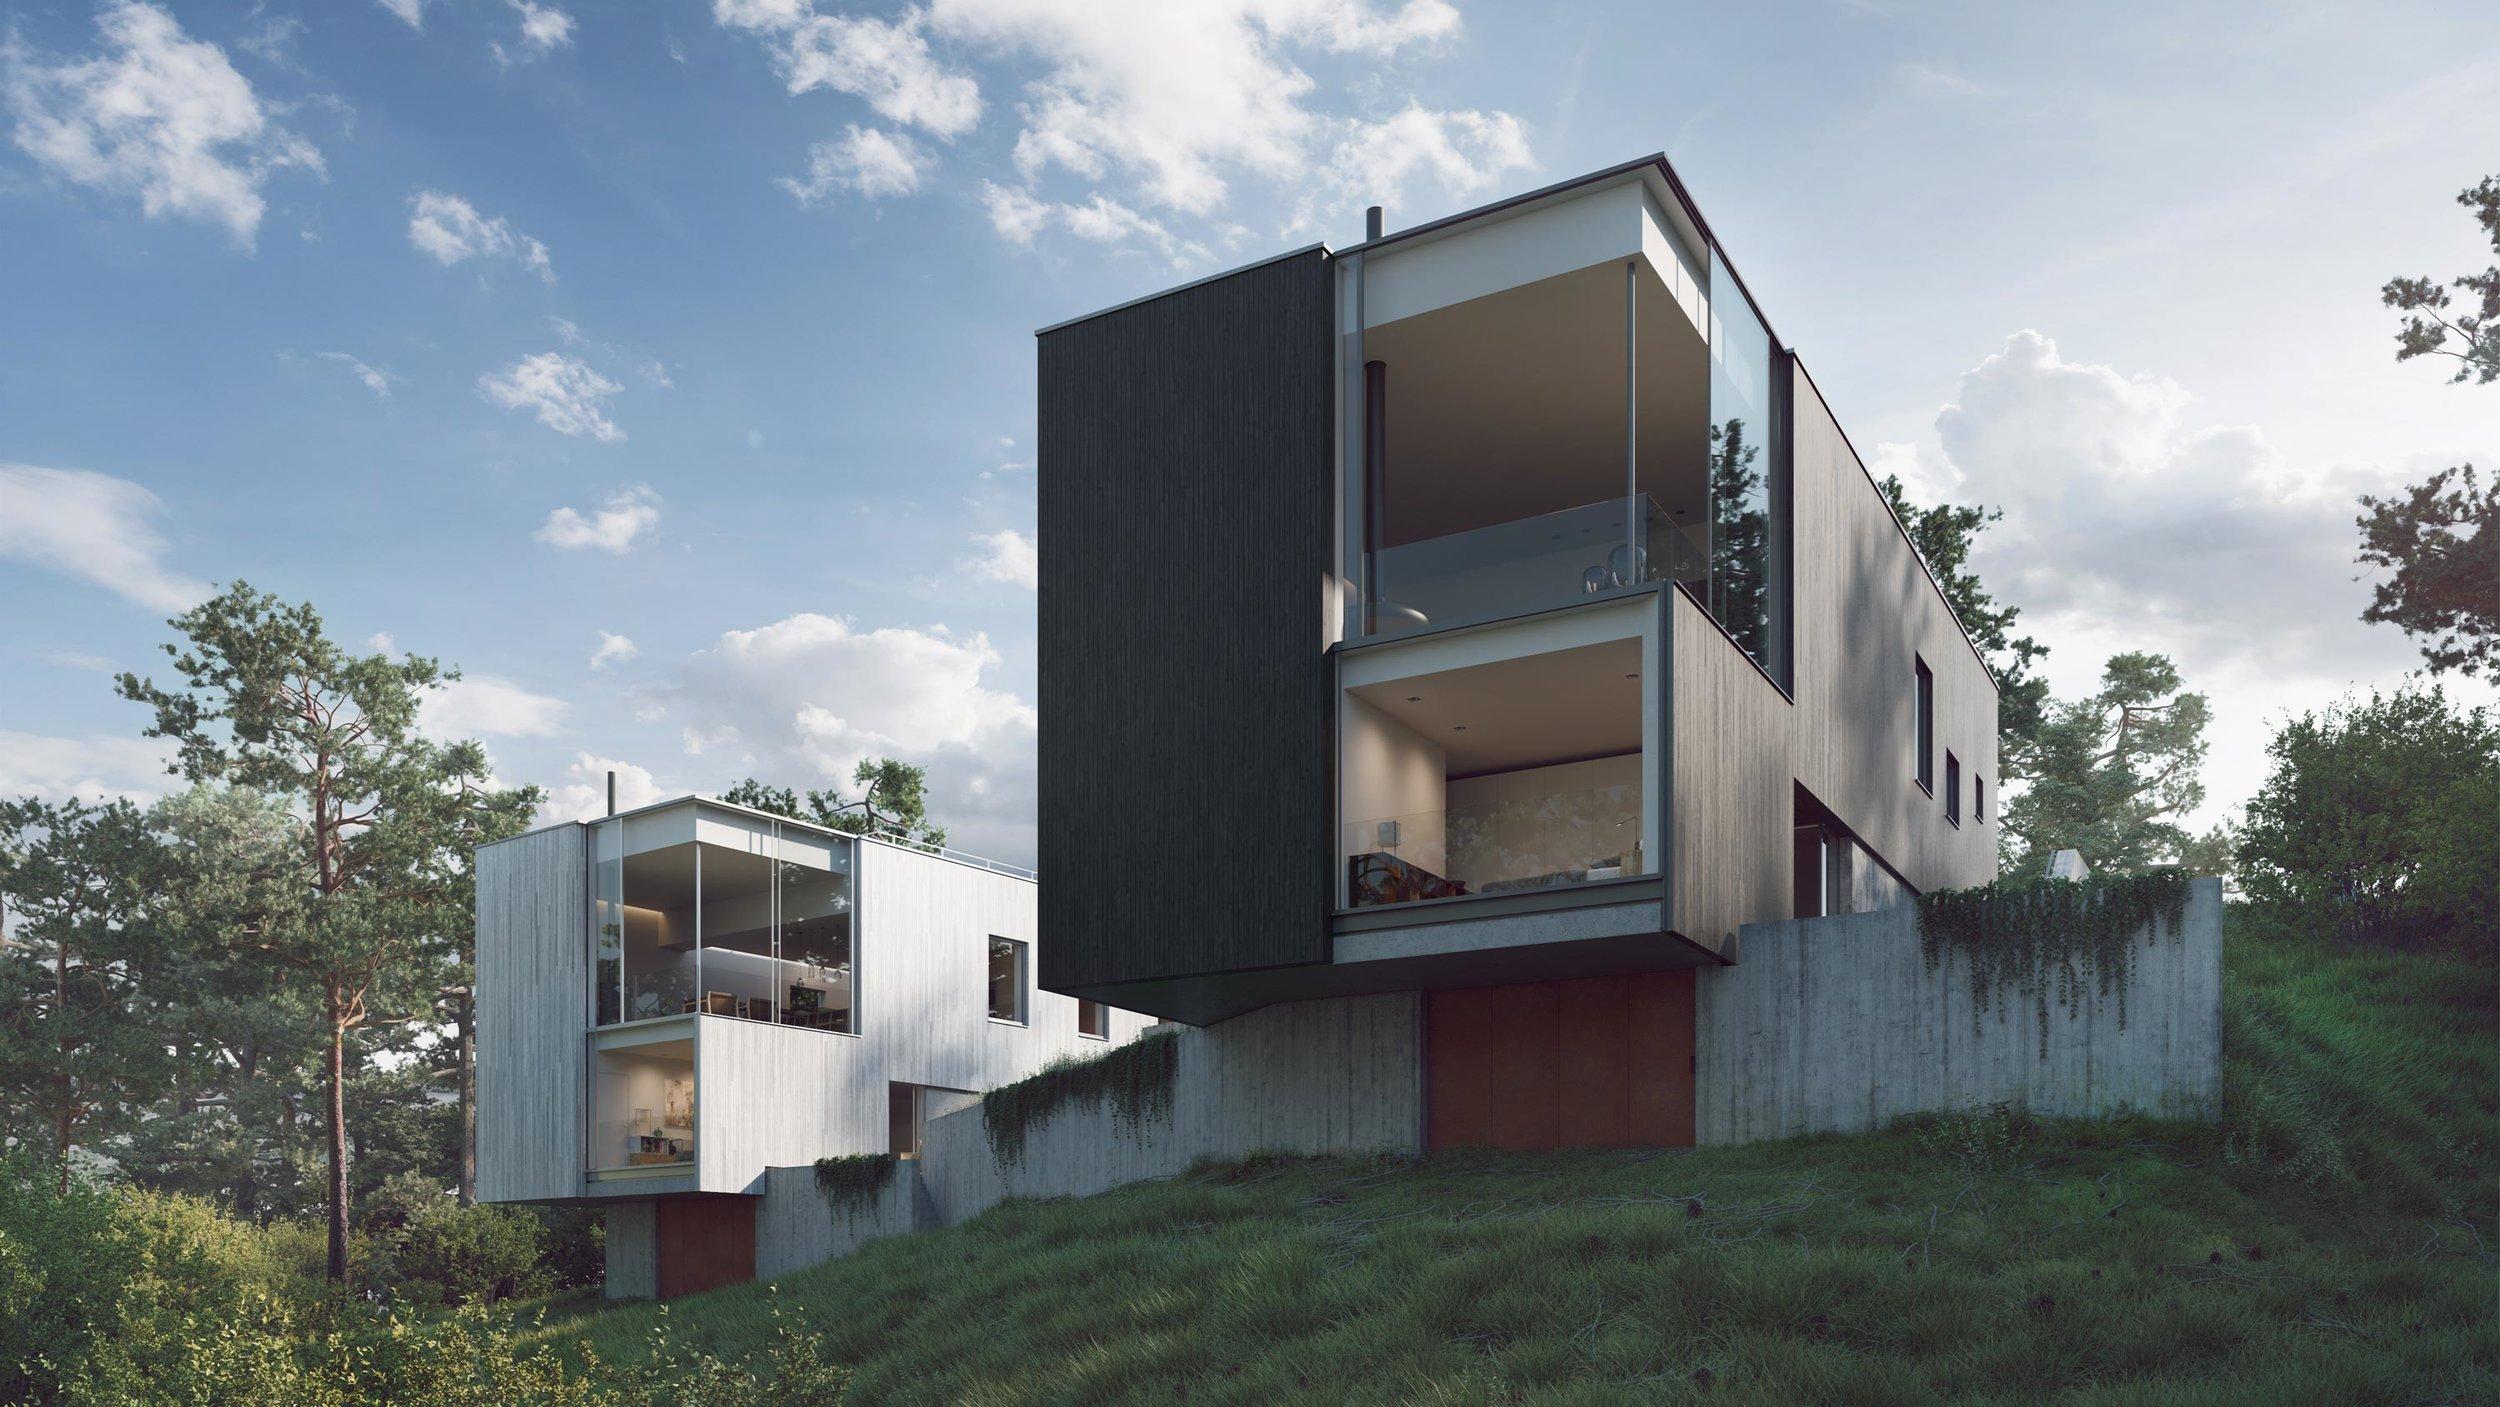 pyrus luxury villas, strom architects, imola, 1.jpg